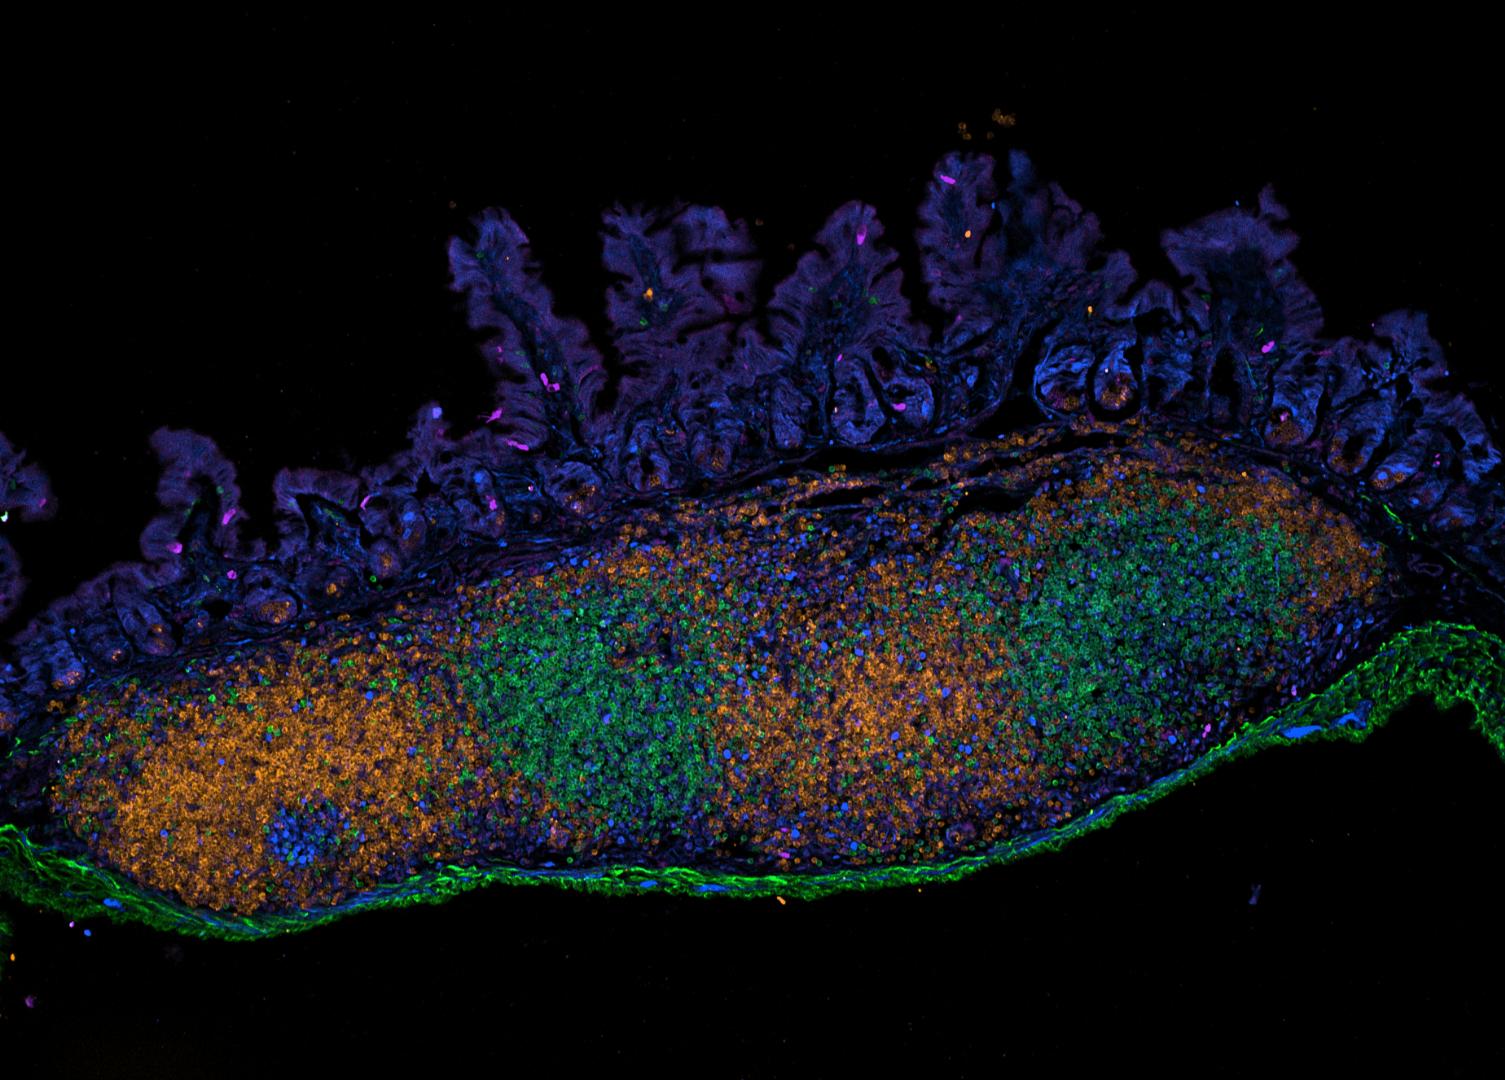 Gut microbiome restoration rejuvenates aging immune system in mice